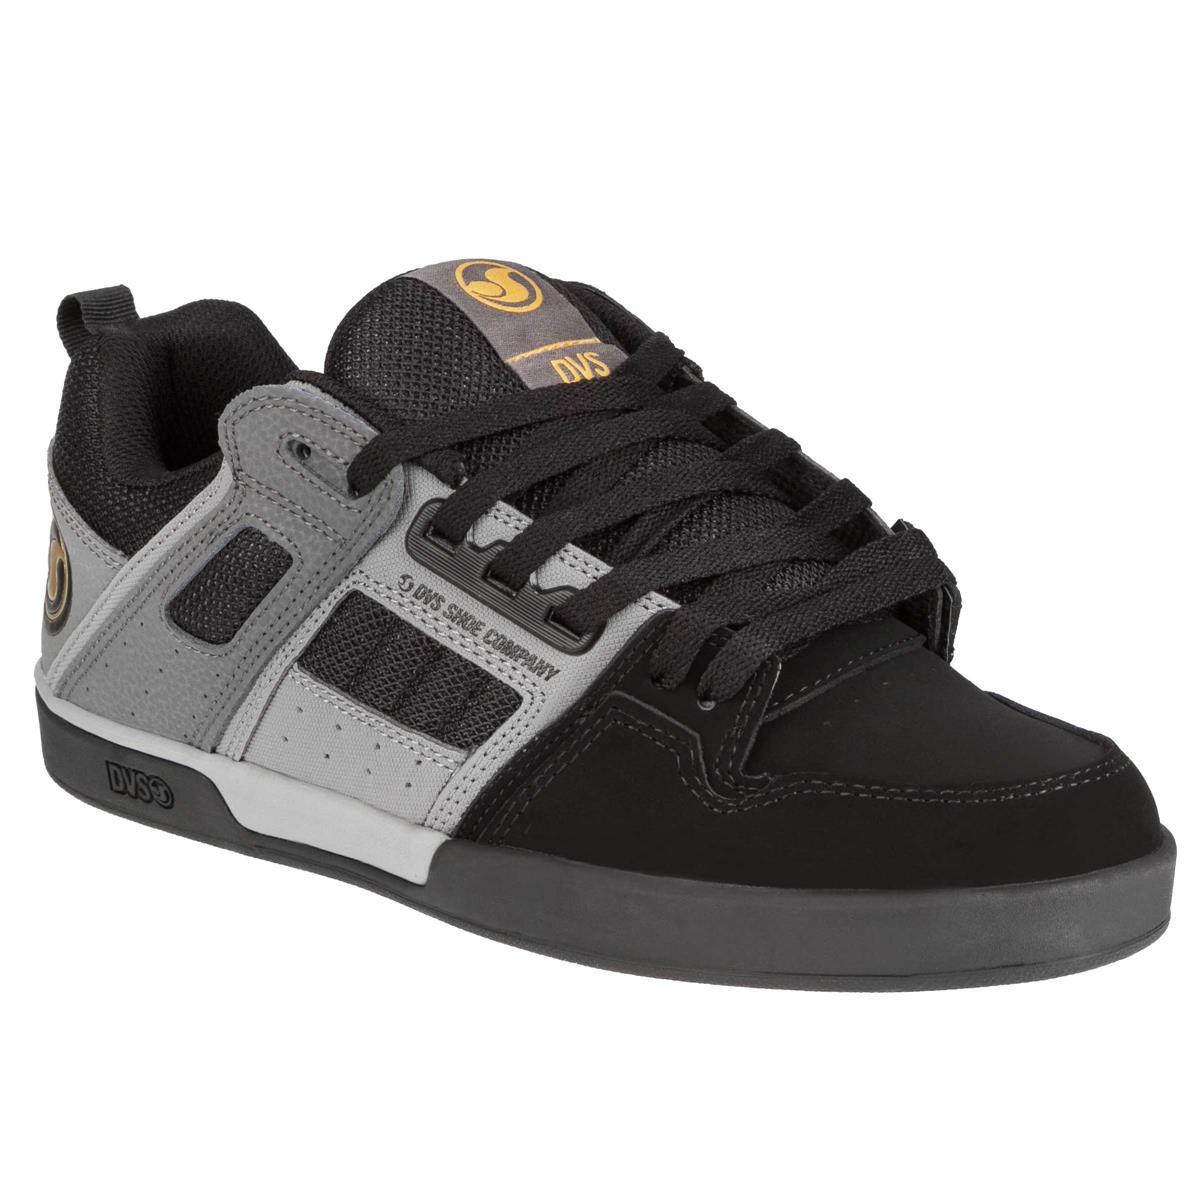 DVS Schuhe Comanche 2.0+ Schwarz/Grau Nubuk